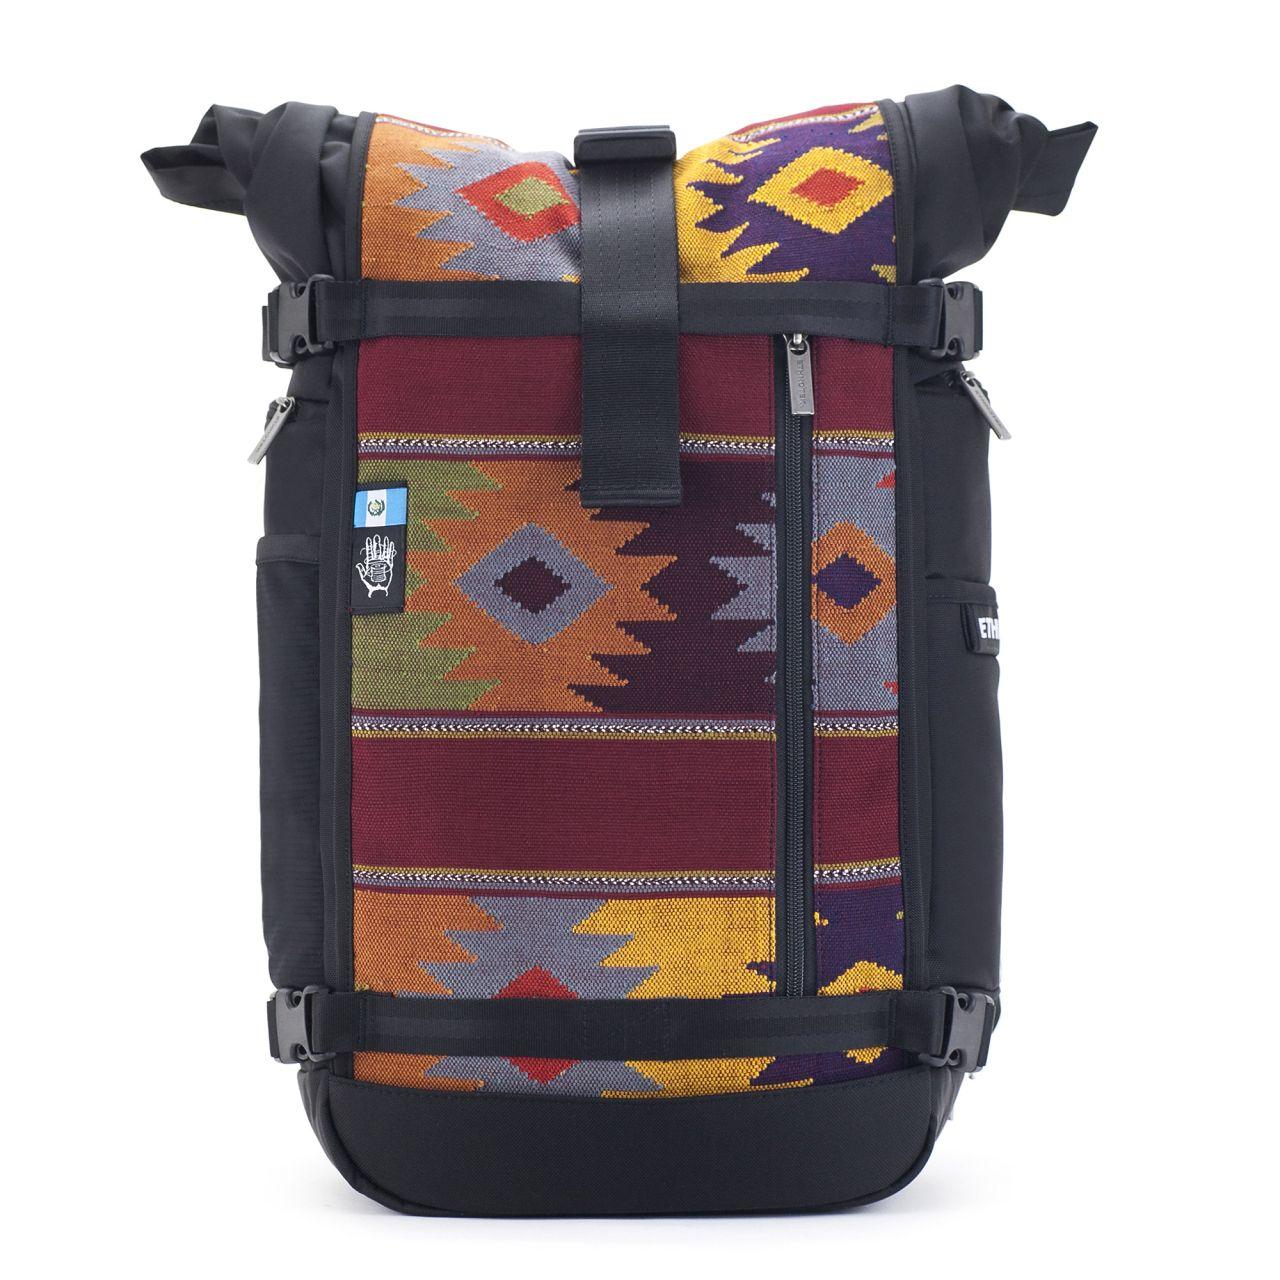 Ethnotek Raja Reise Rucksack 46 mit Classic Thread Guatemala 5